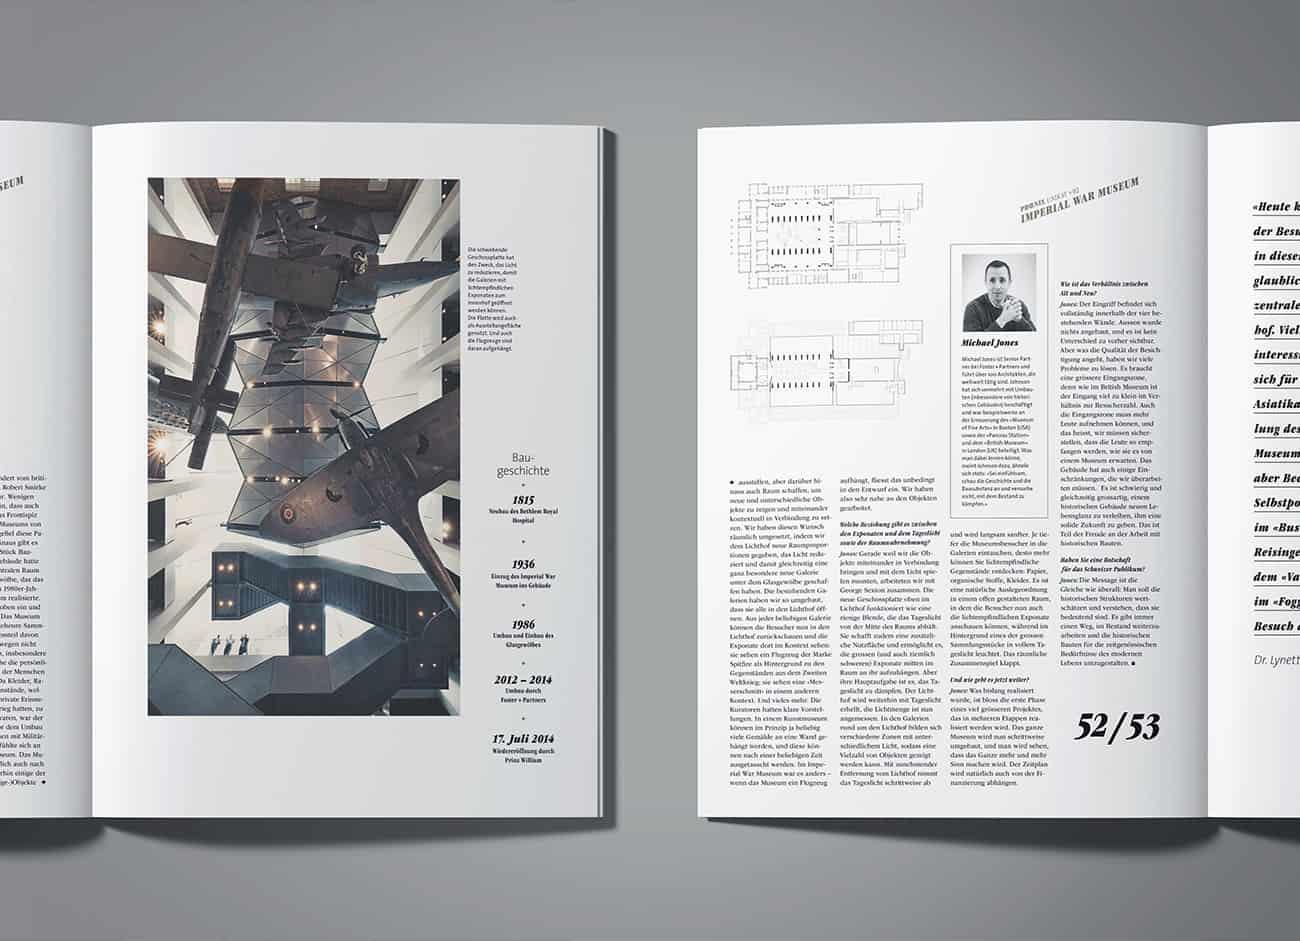 magazine-exmaple-architecture